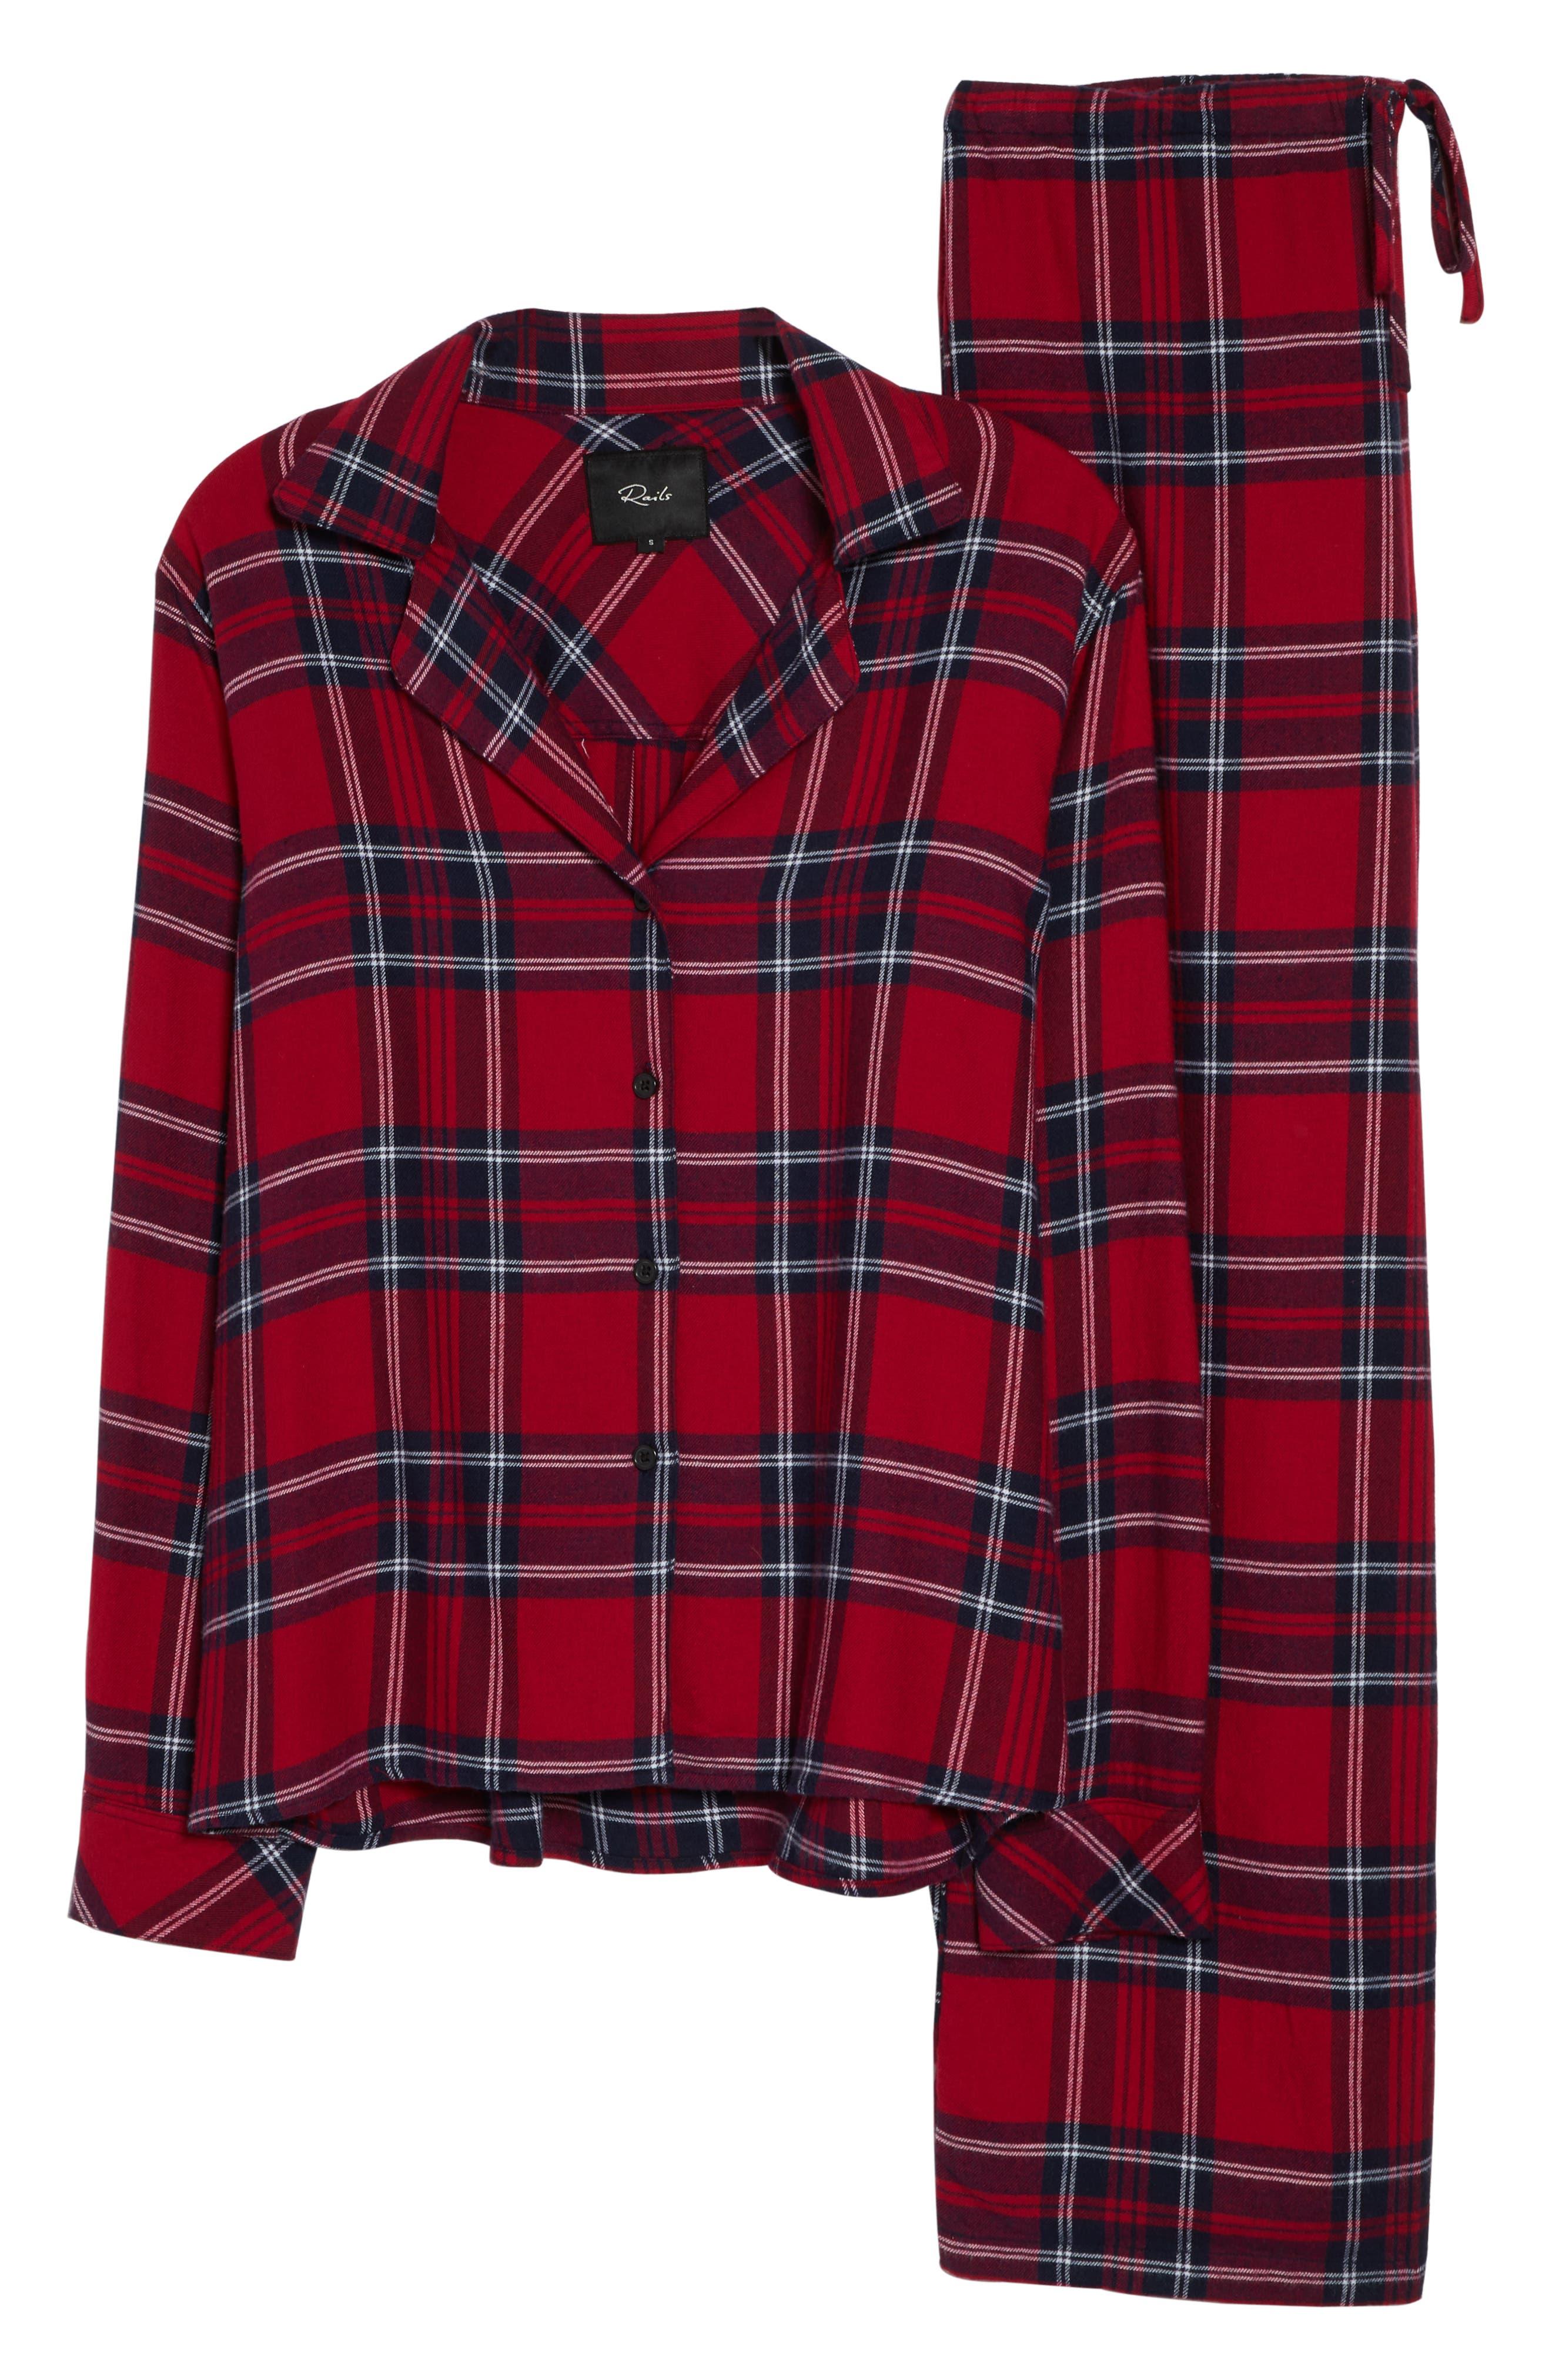 Plaid Pajamas,                             Alternate thumbnail 6, color,                             SCARLET NAVY WHITE